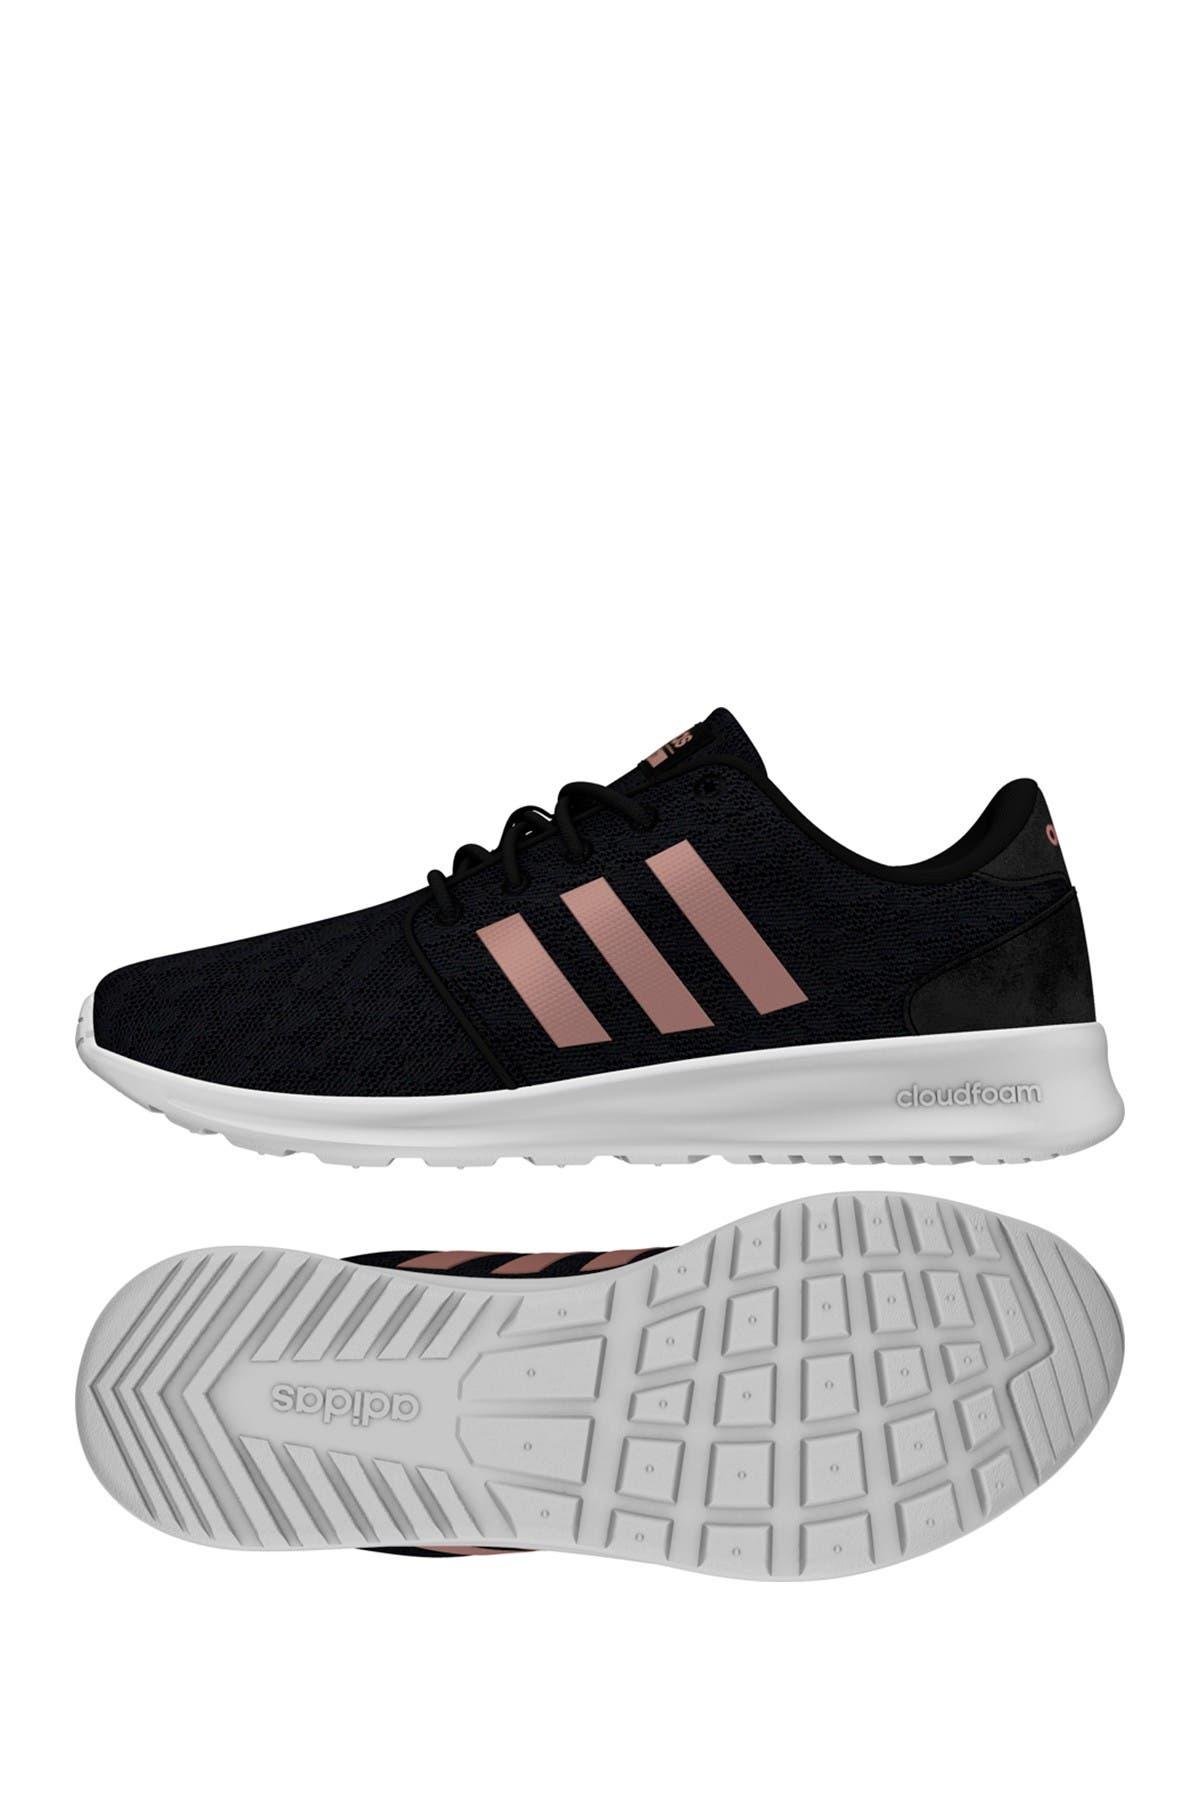 Image of adidas Cloudfoam QT Racer Sneaker